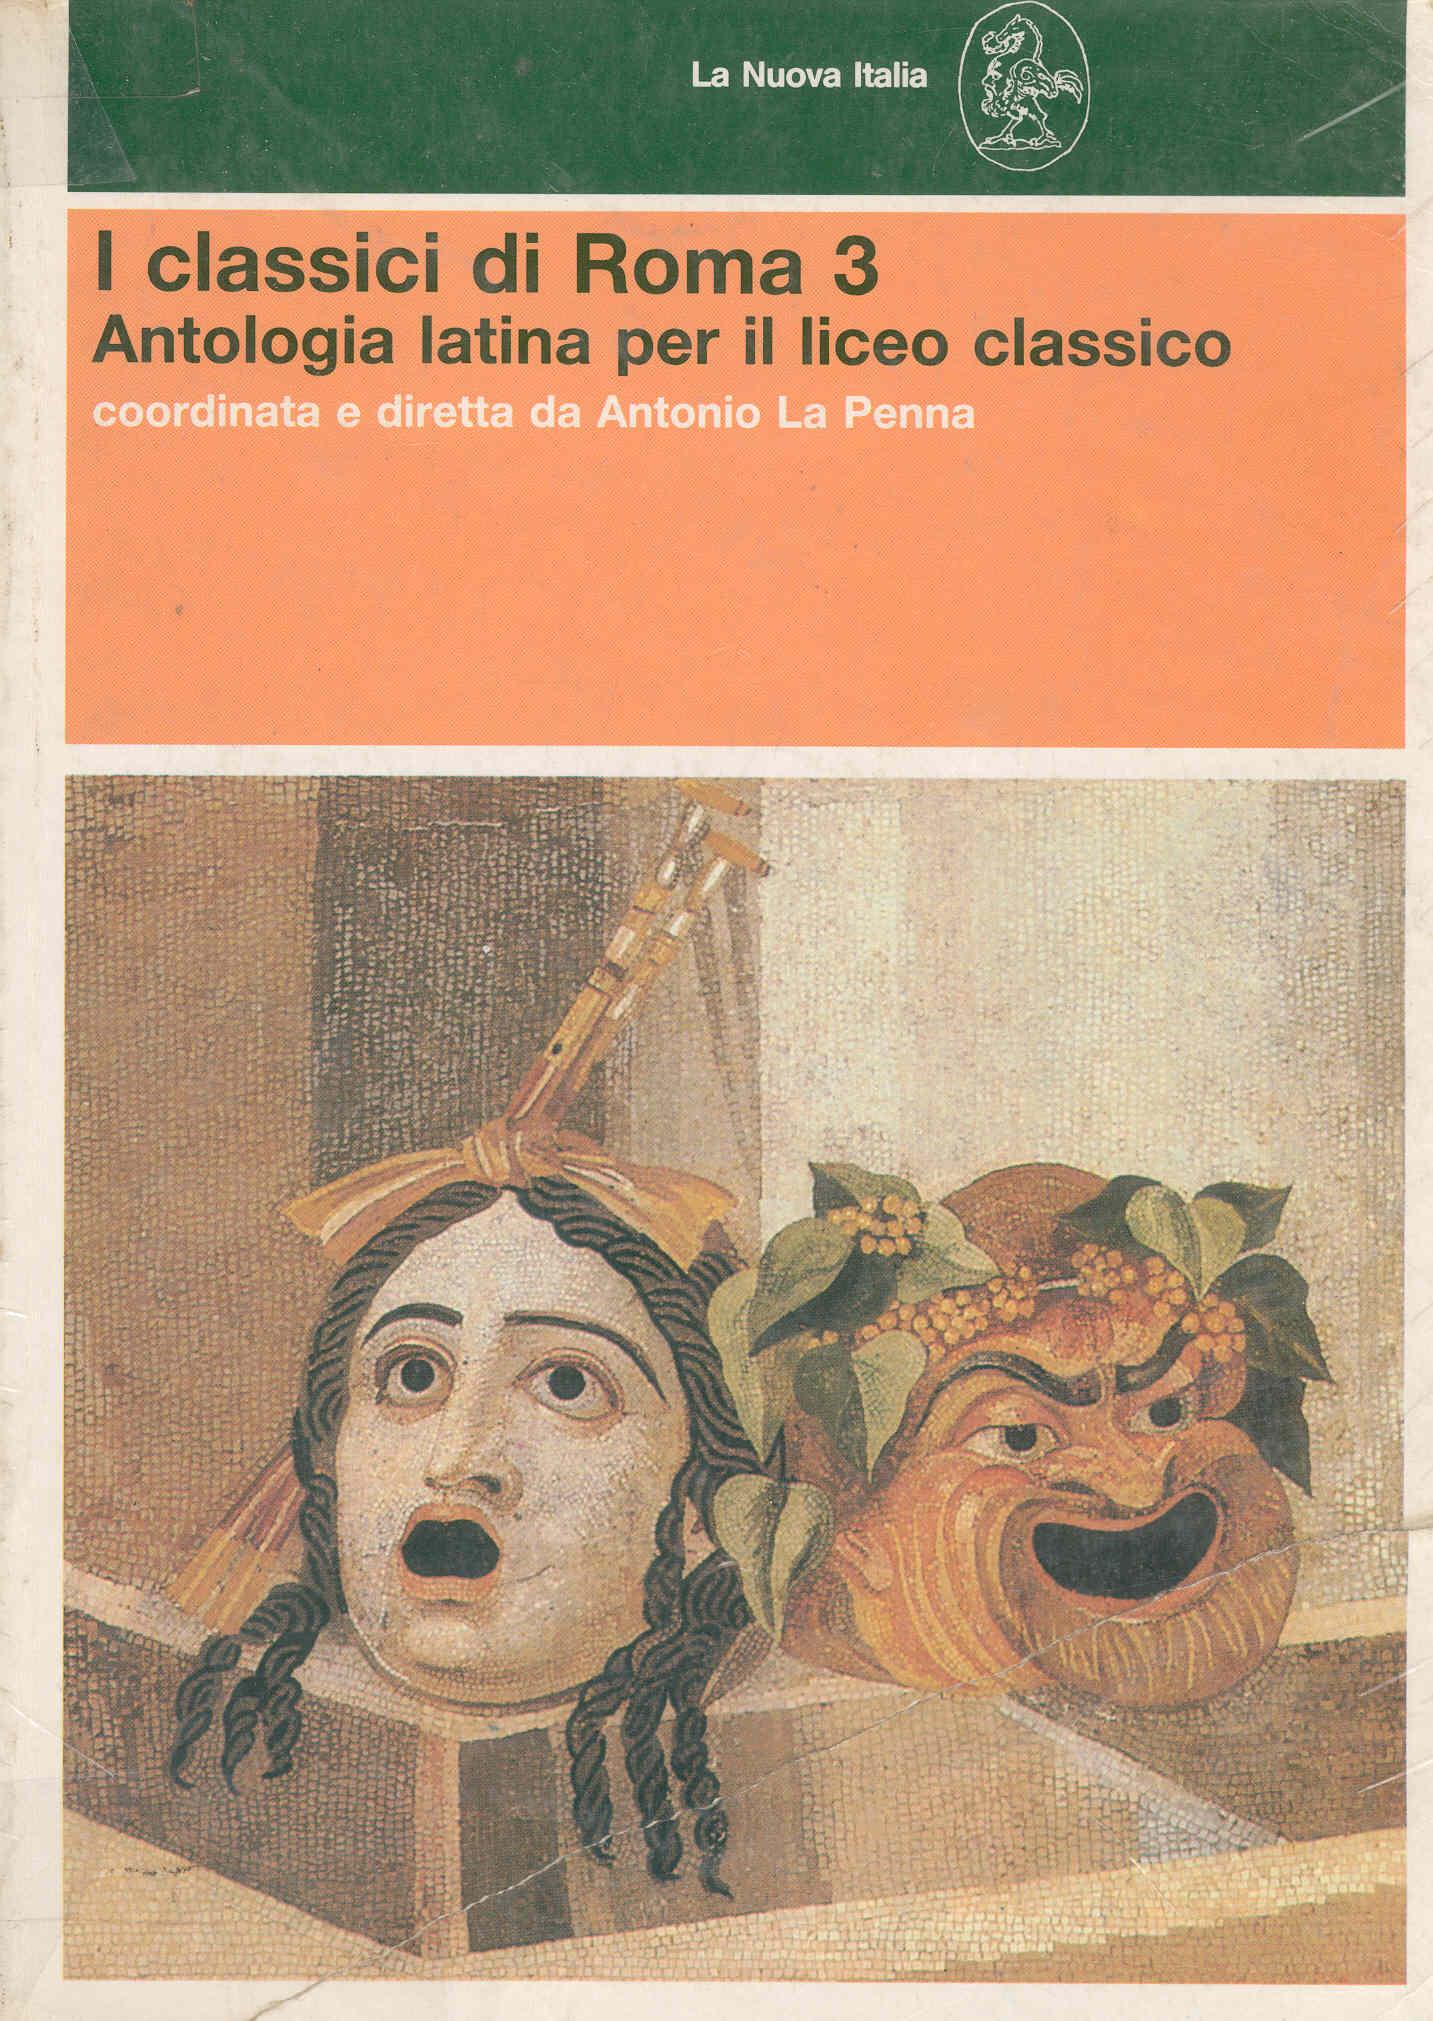 I classici di Roma 3